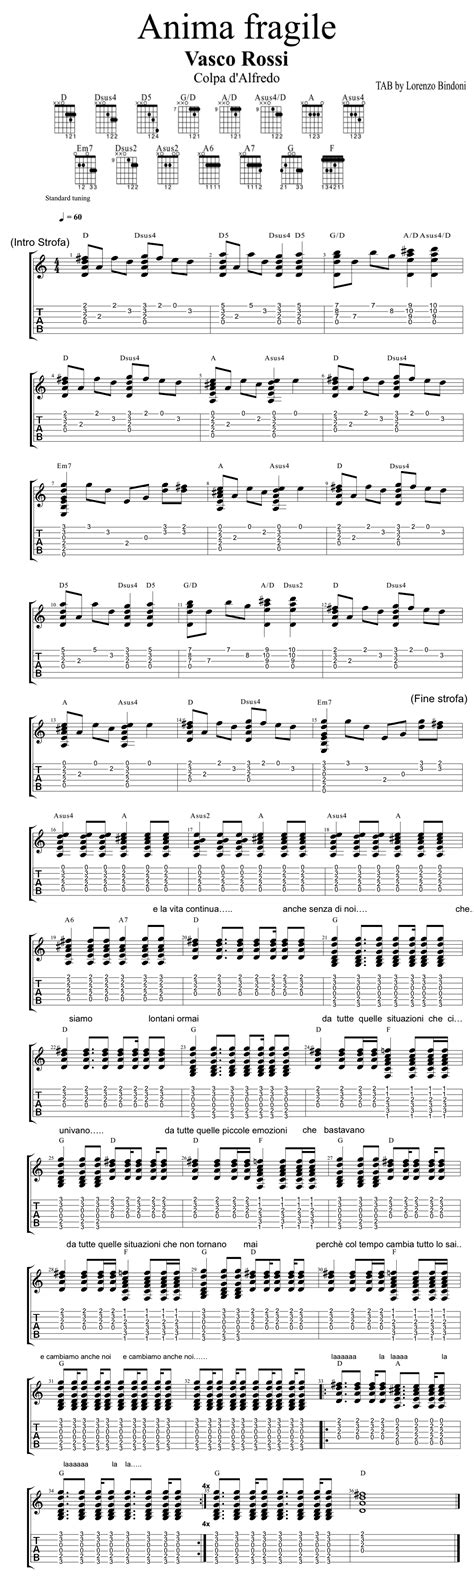 Canzone Vasco Tab by Tab Completa Versione Originale Anima Fragile Vasco